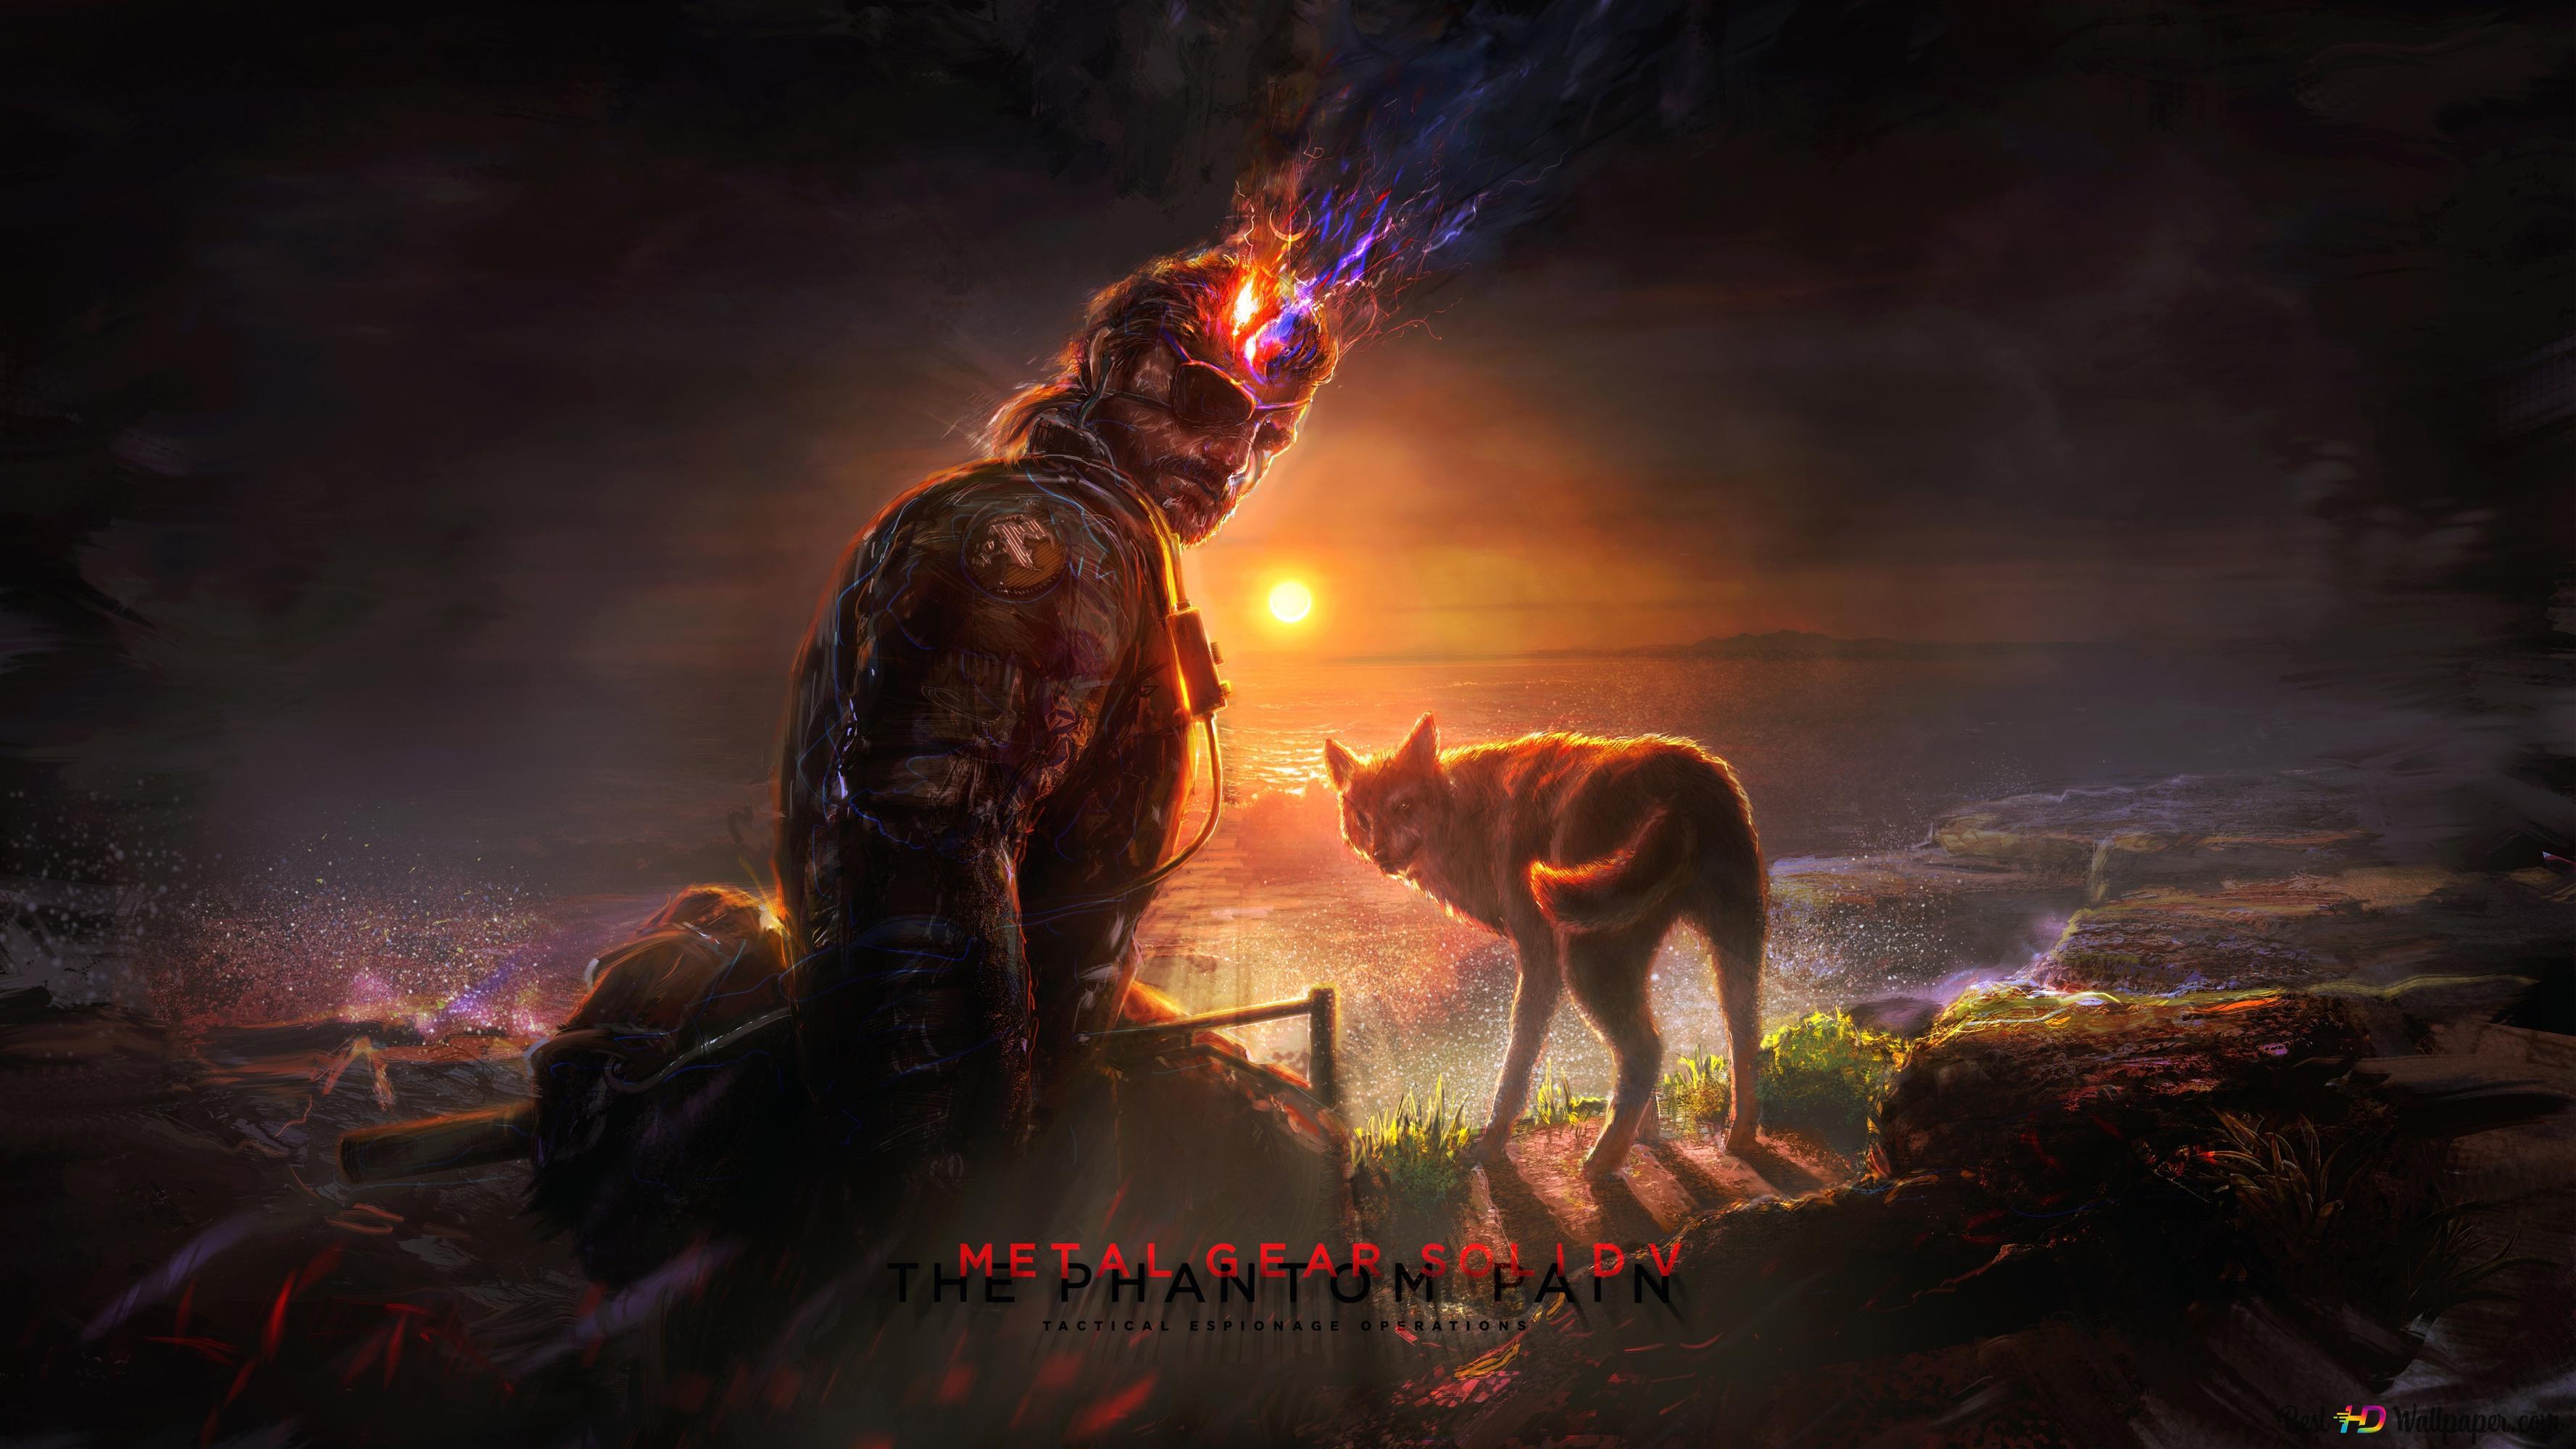 Metal Gear Solid V The Phantom Pain Hd Wallpaper Download